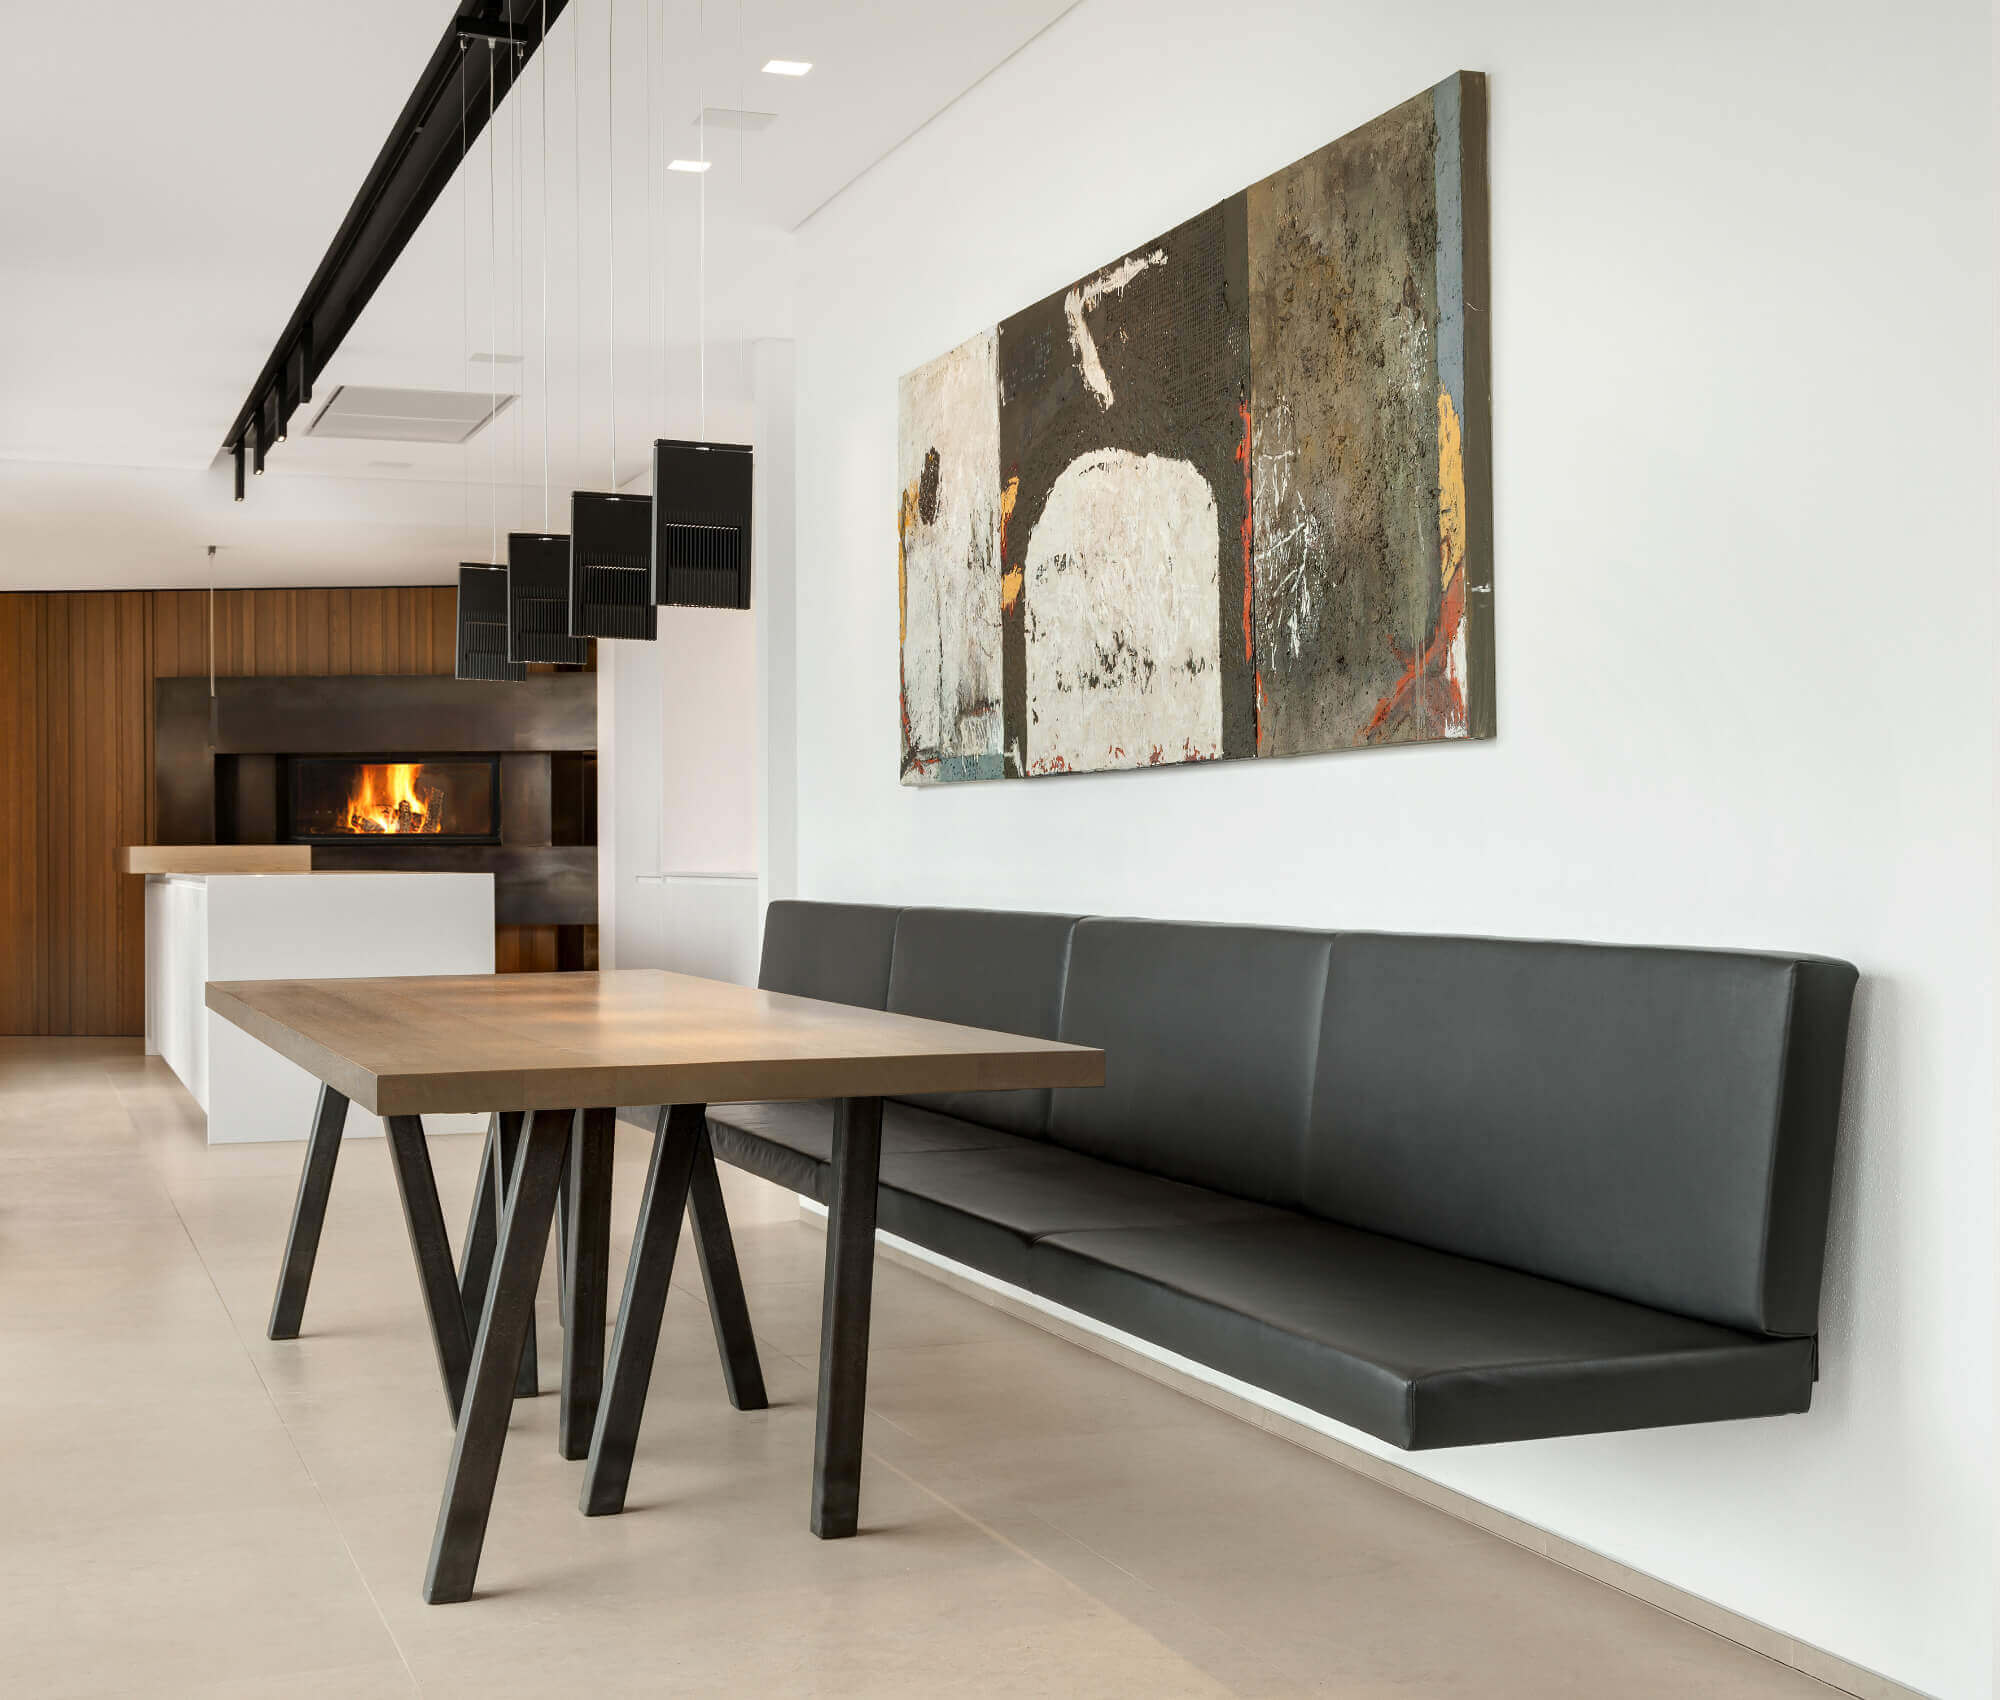 sitzbank küche holz | sitzbänke maßanfertigung terporten viersen